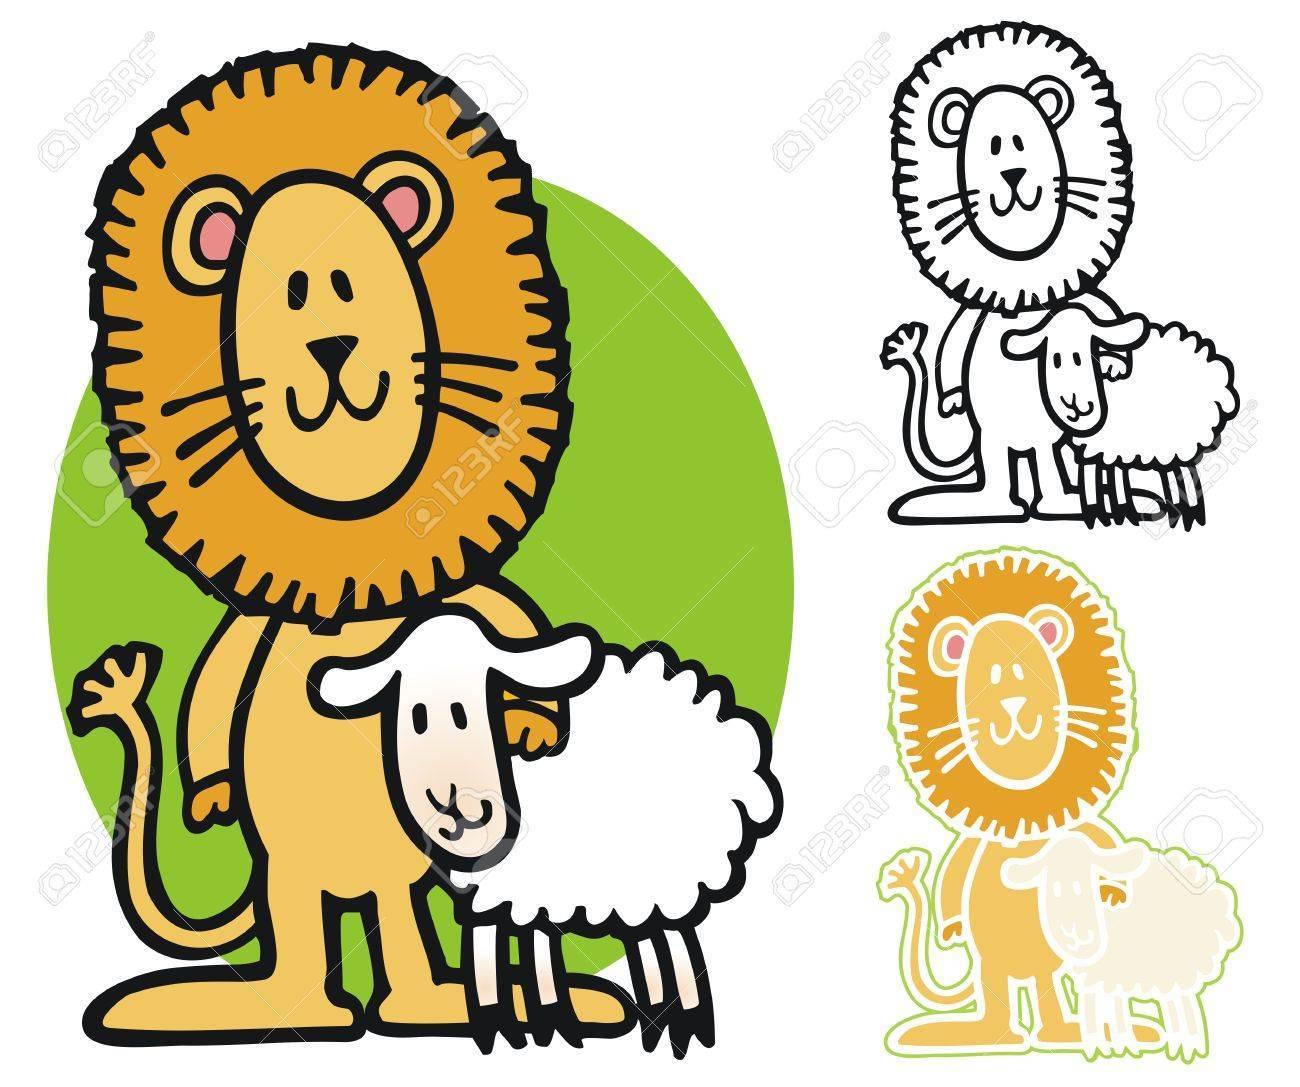 March lion lamb clipart 6 » Clipart Portal.